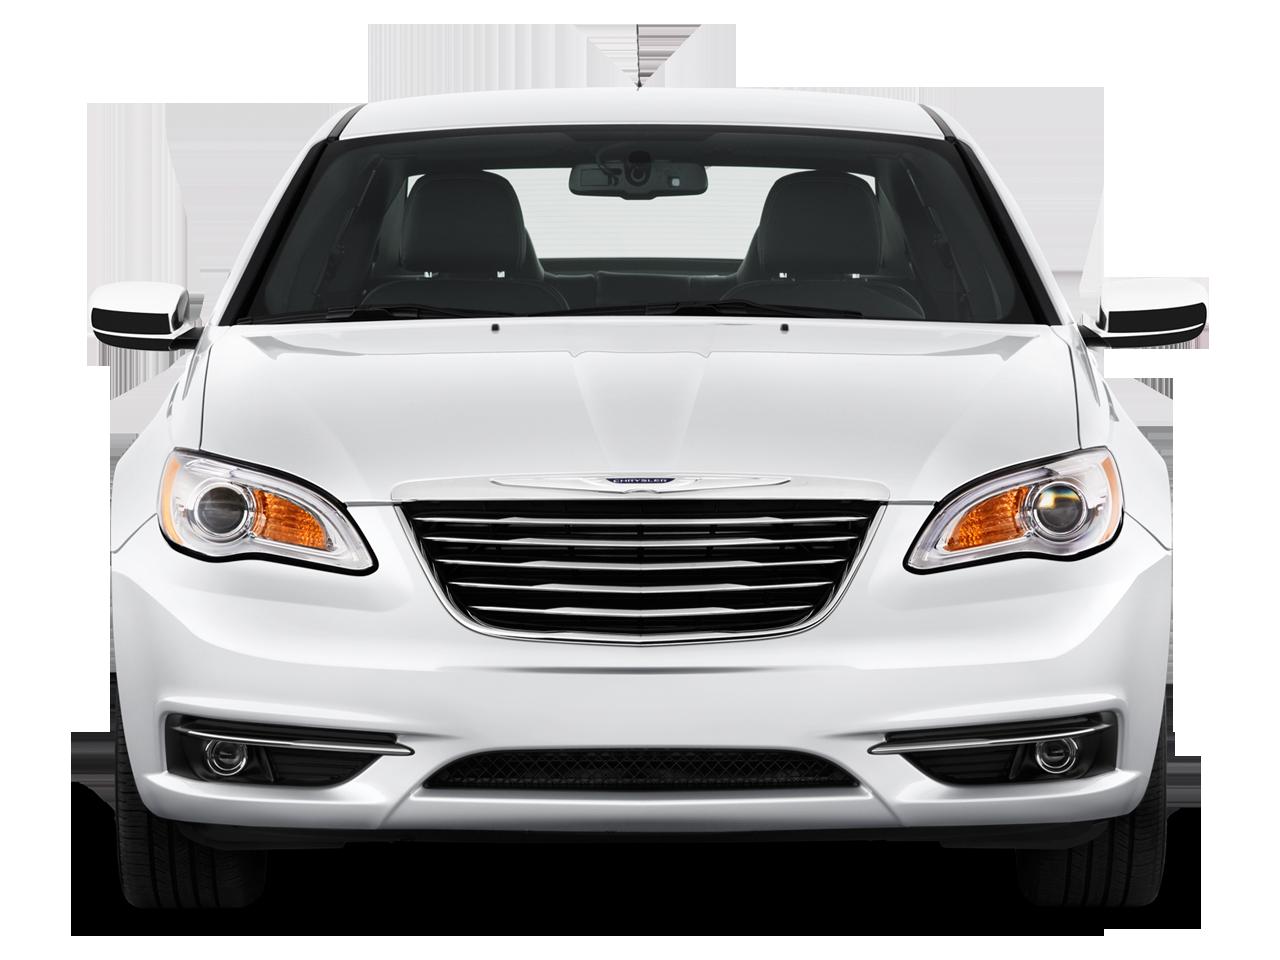 2021 Chrysler 200 Convertible Specs